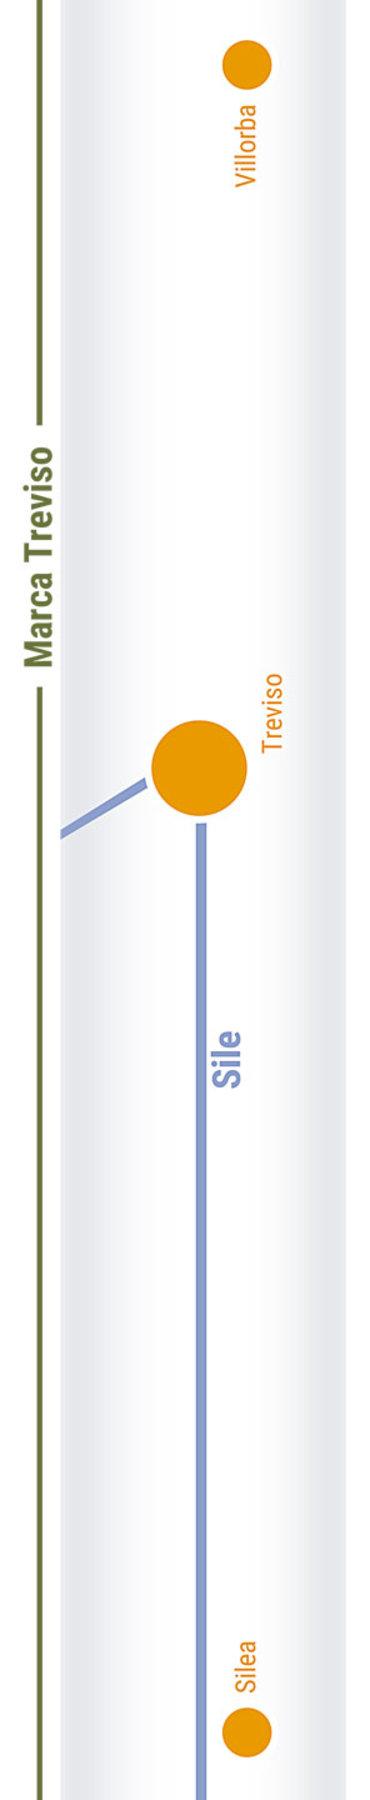 Übersichtskarte rechts Teilabschnitt 39a Treviso